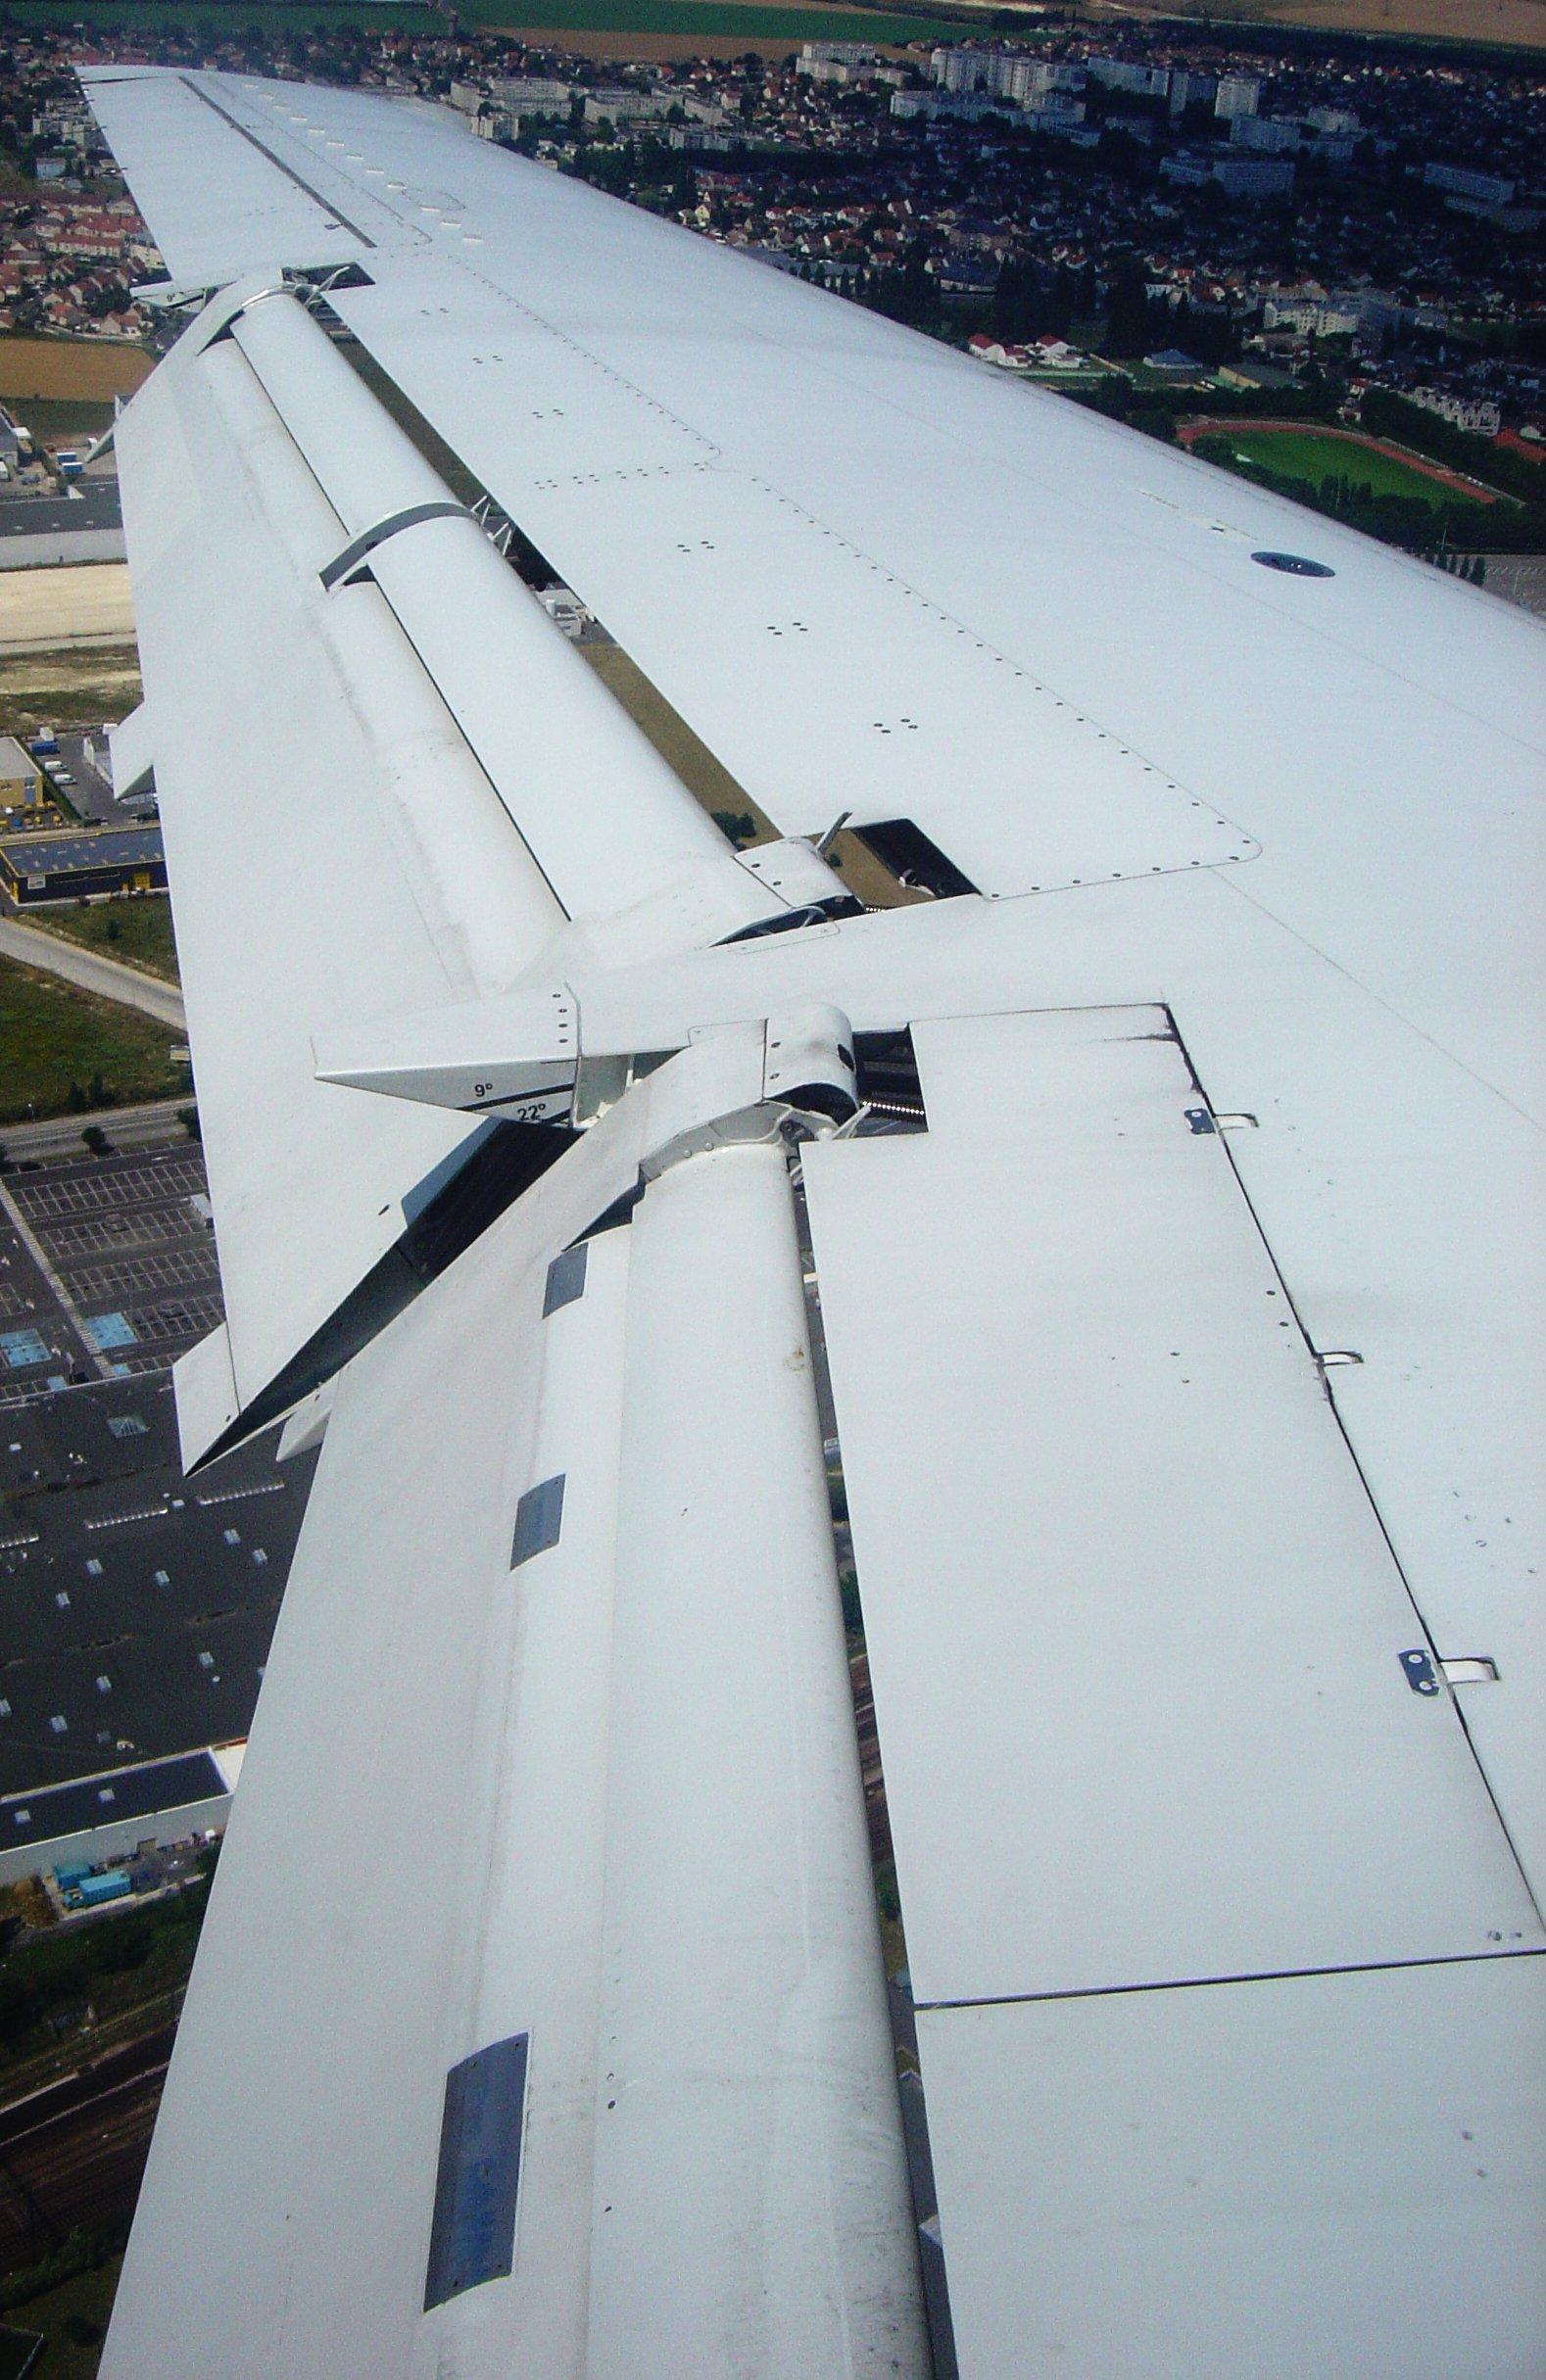 File:Aircraft wing flaps full dsc06835 jpg - Wikimedia Commons